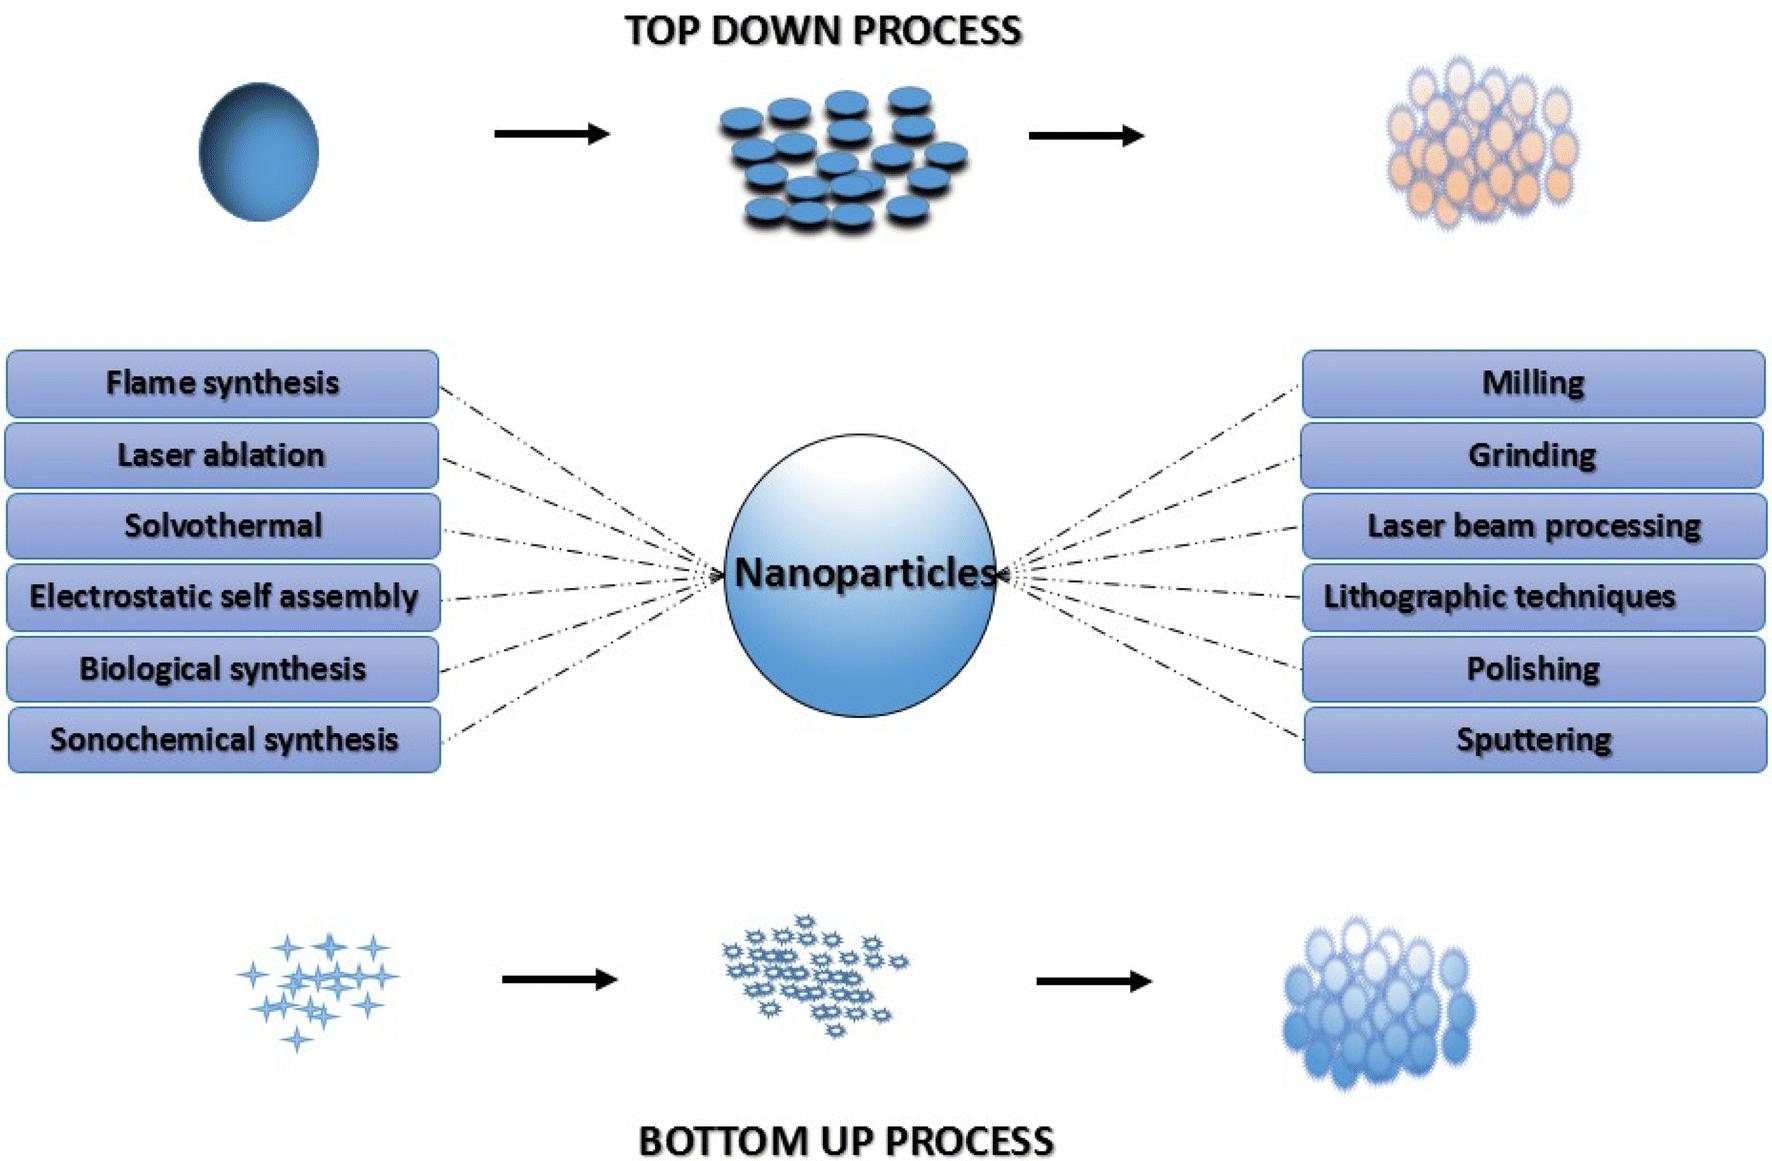 Bio-nanobactericides: an emanating class of nanoparticles